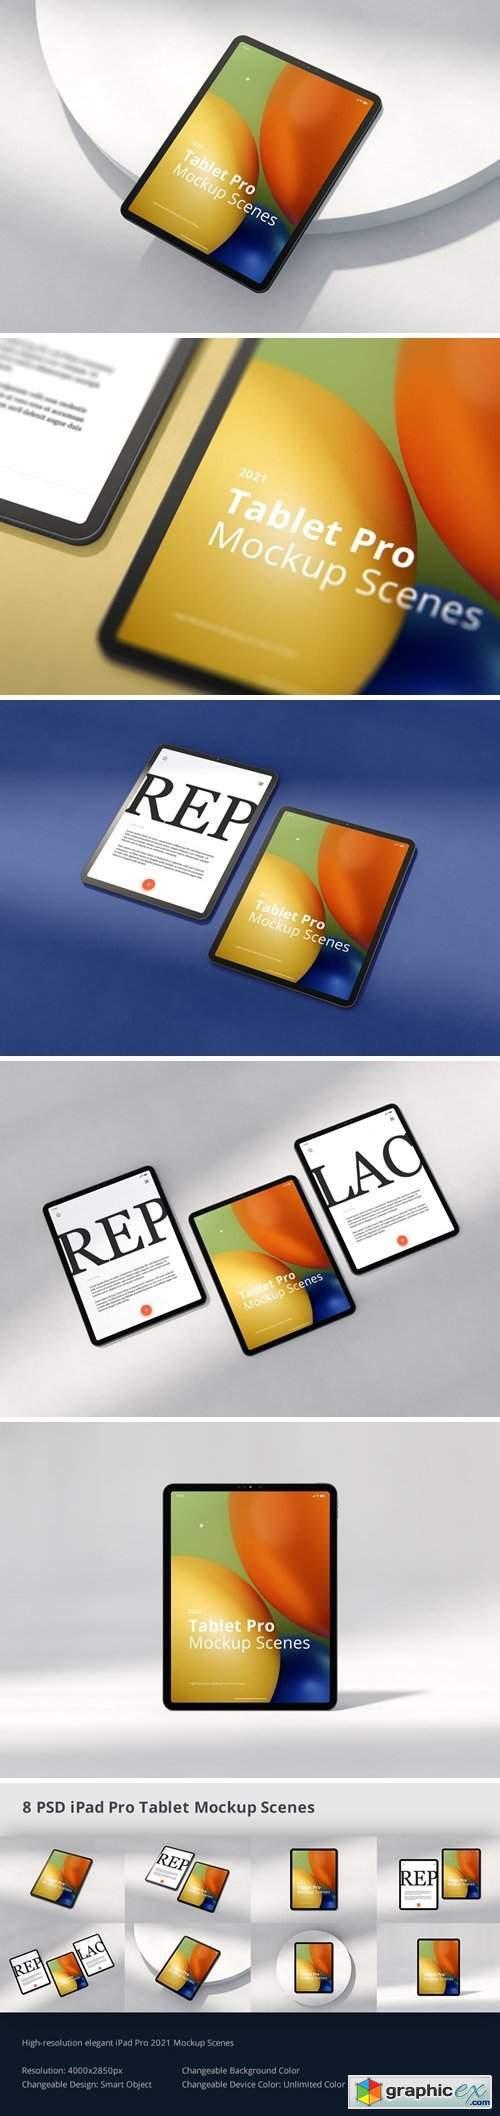 Tablet Pro Mockup Scenes 2021